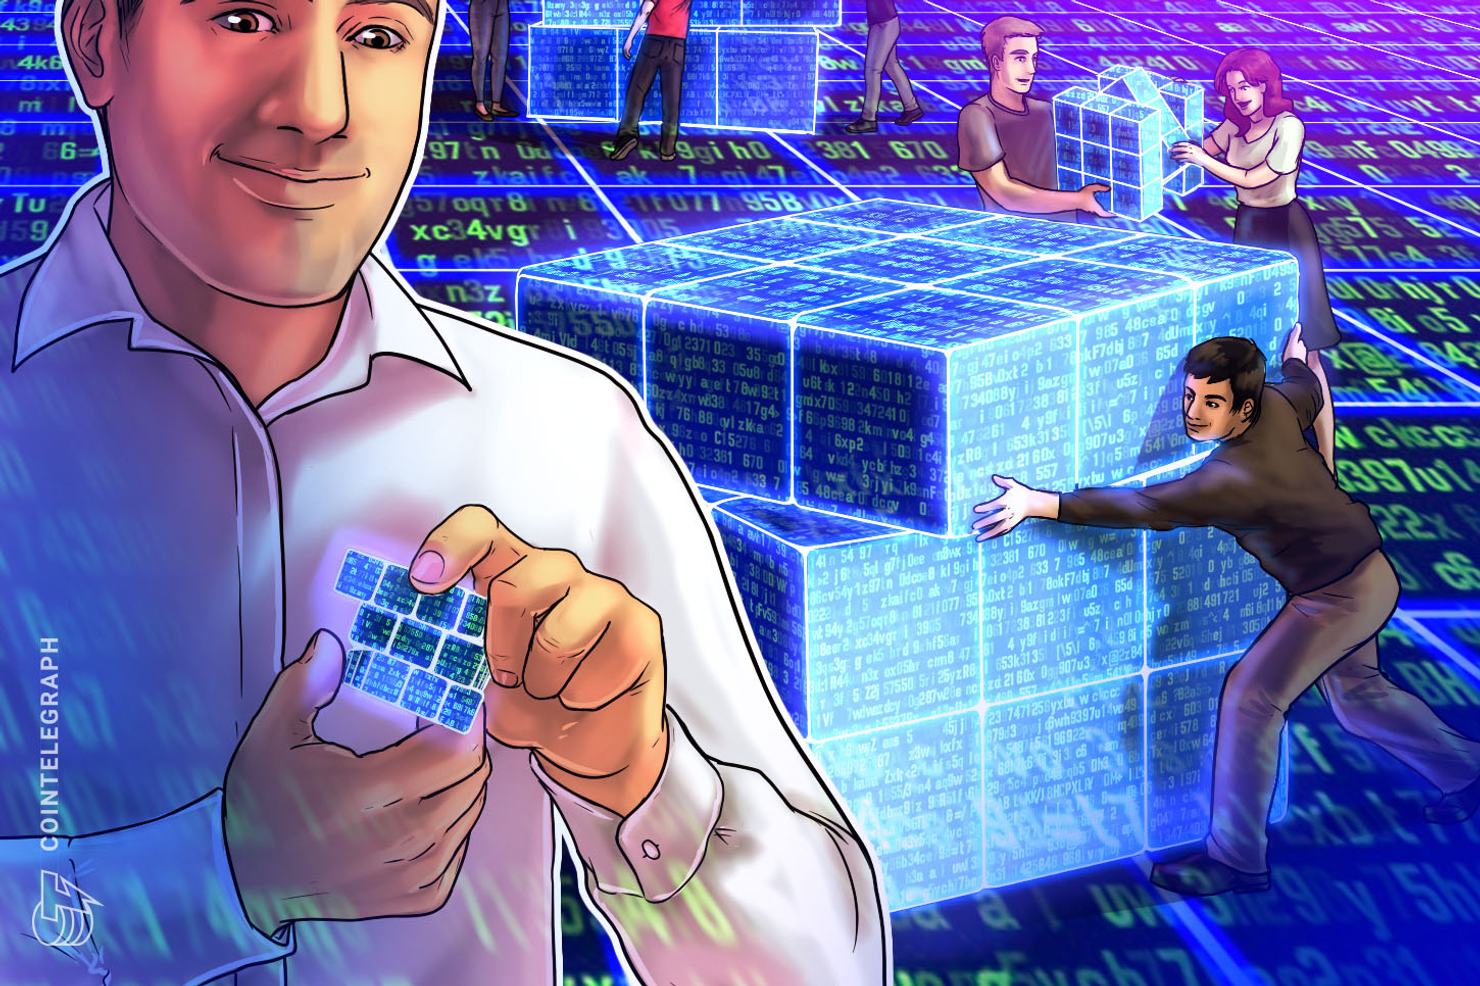 COINTELEGRAPH: Bitcoin Cash Difficulty Volatile Ahead of Nov. 15 Hard Fork